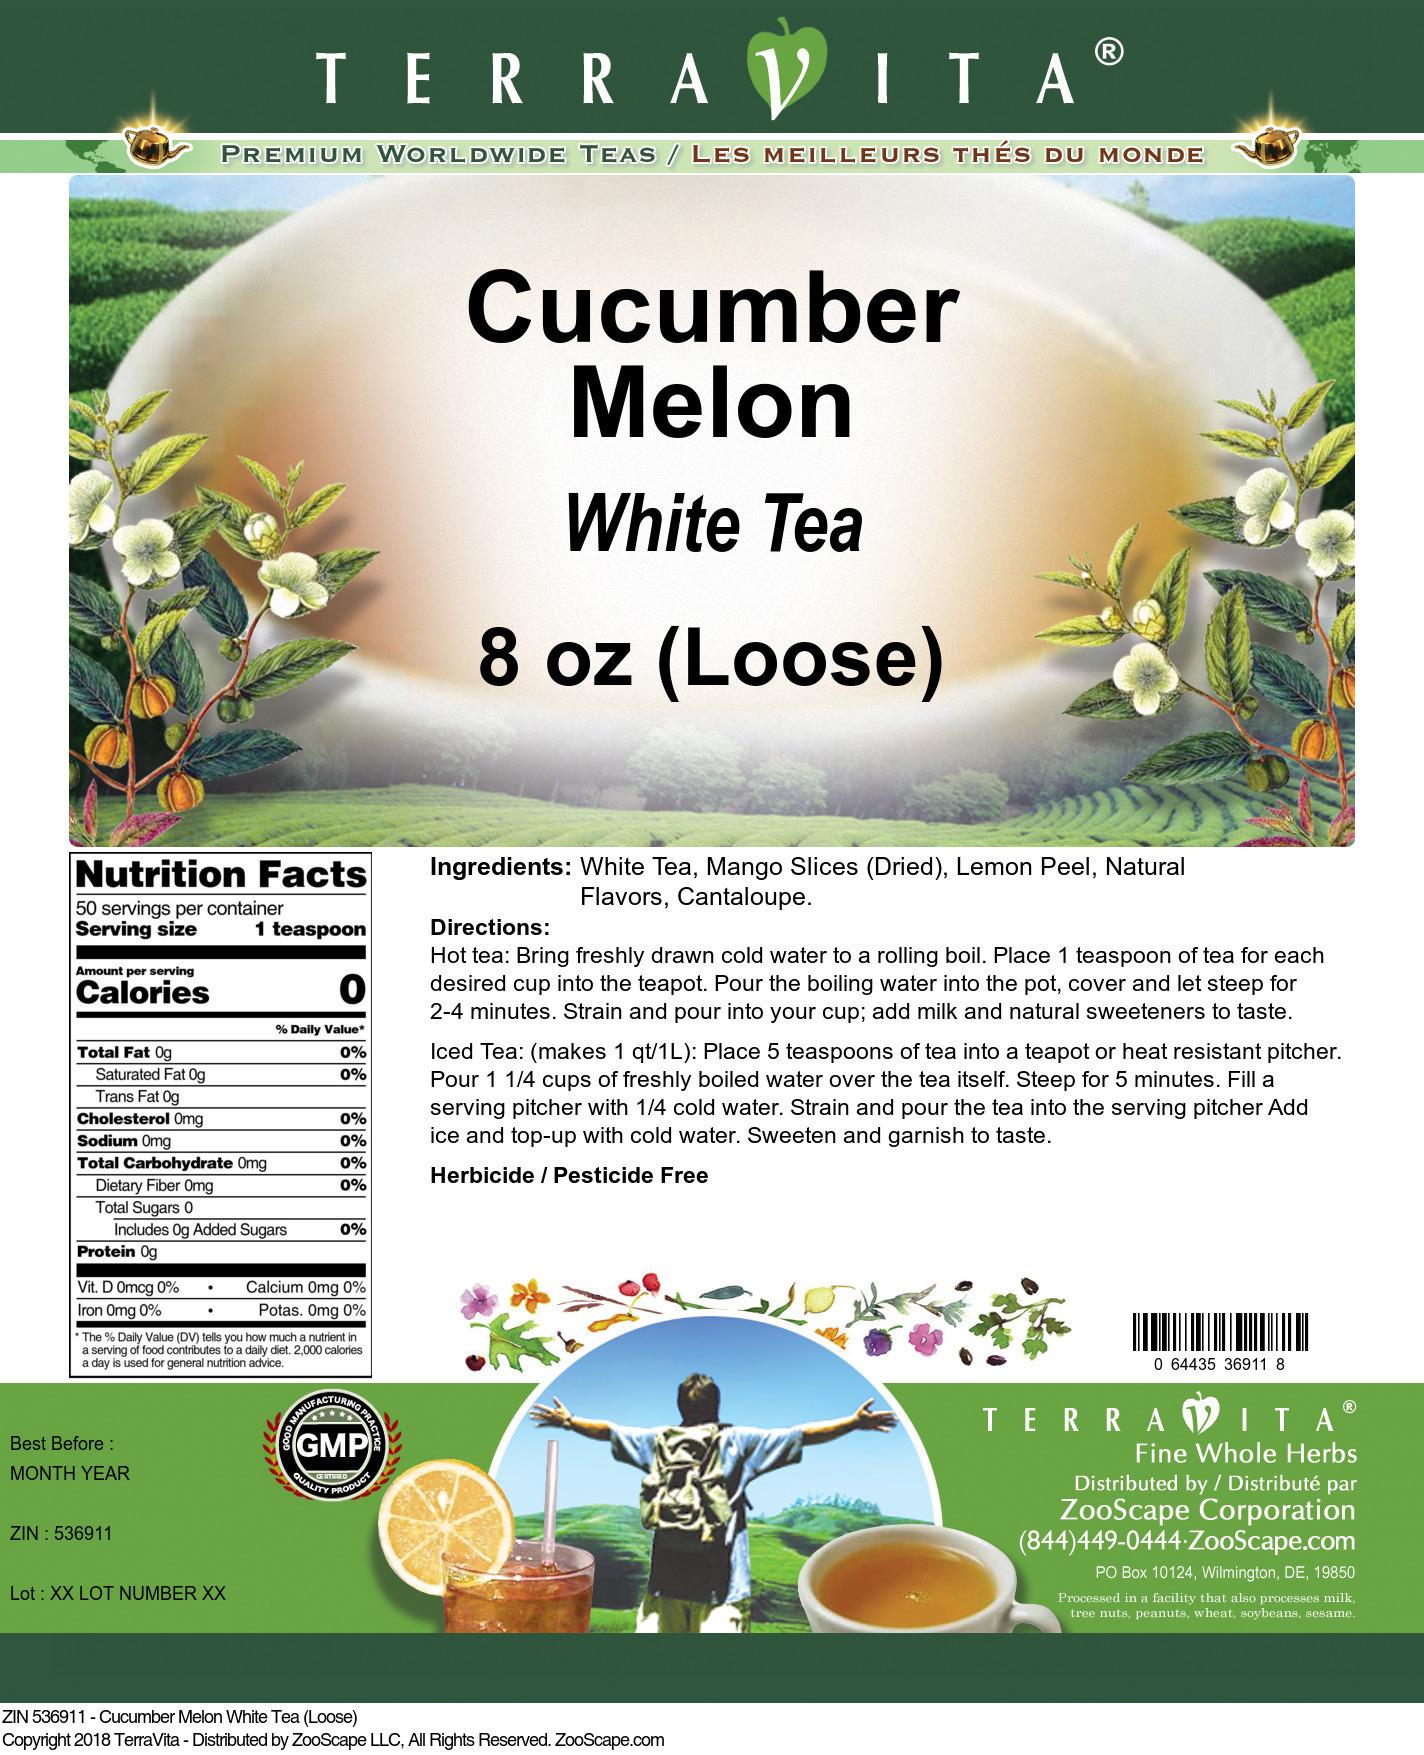 Cucumber Melon White Tea (Loose)